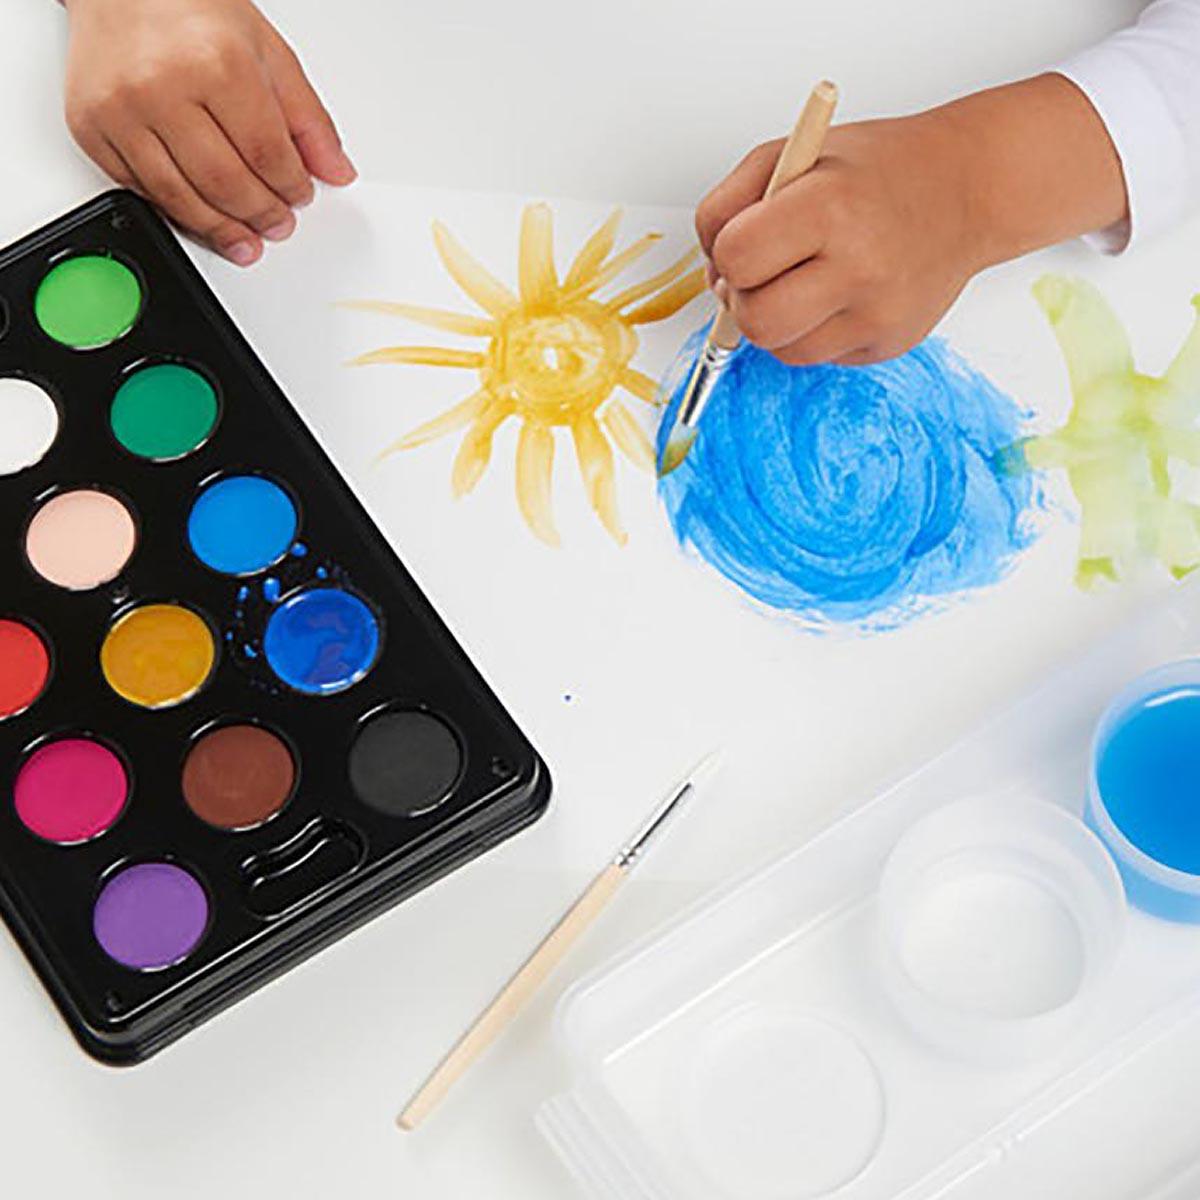 paints-kitchen-worktops